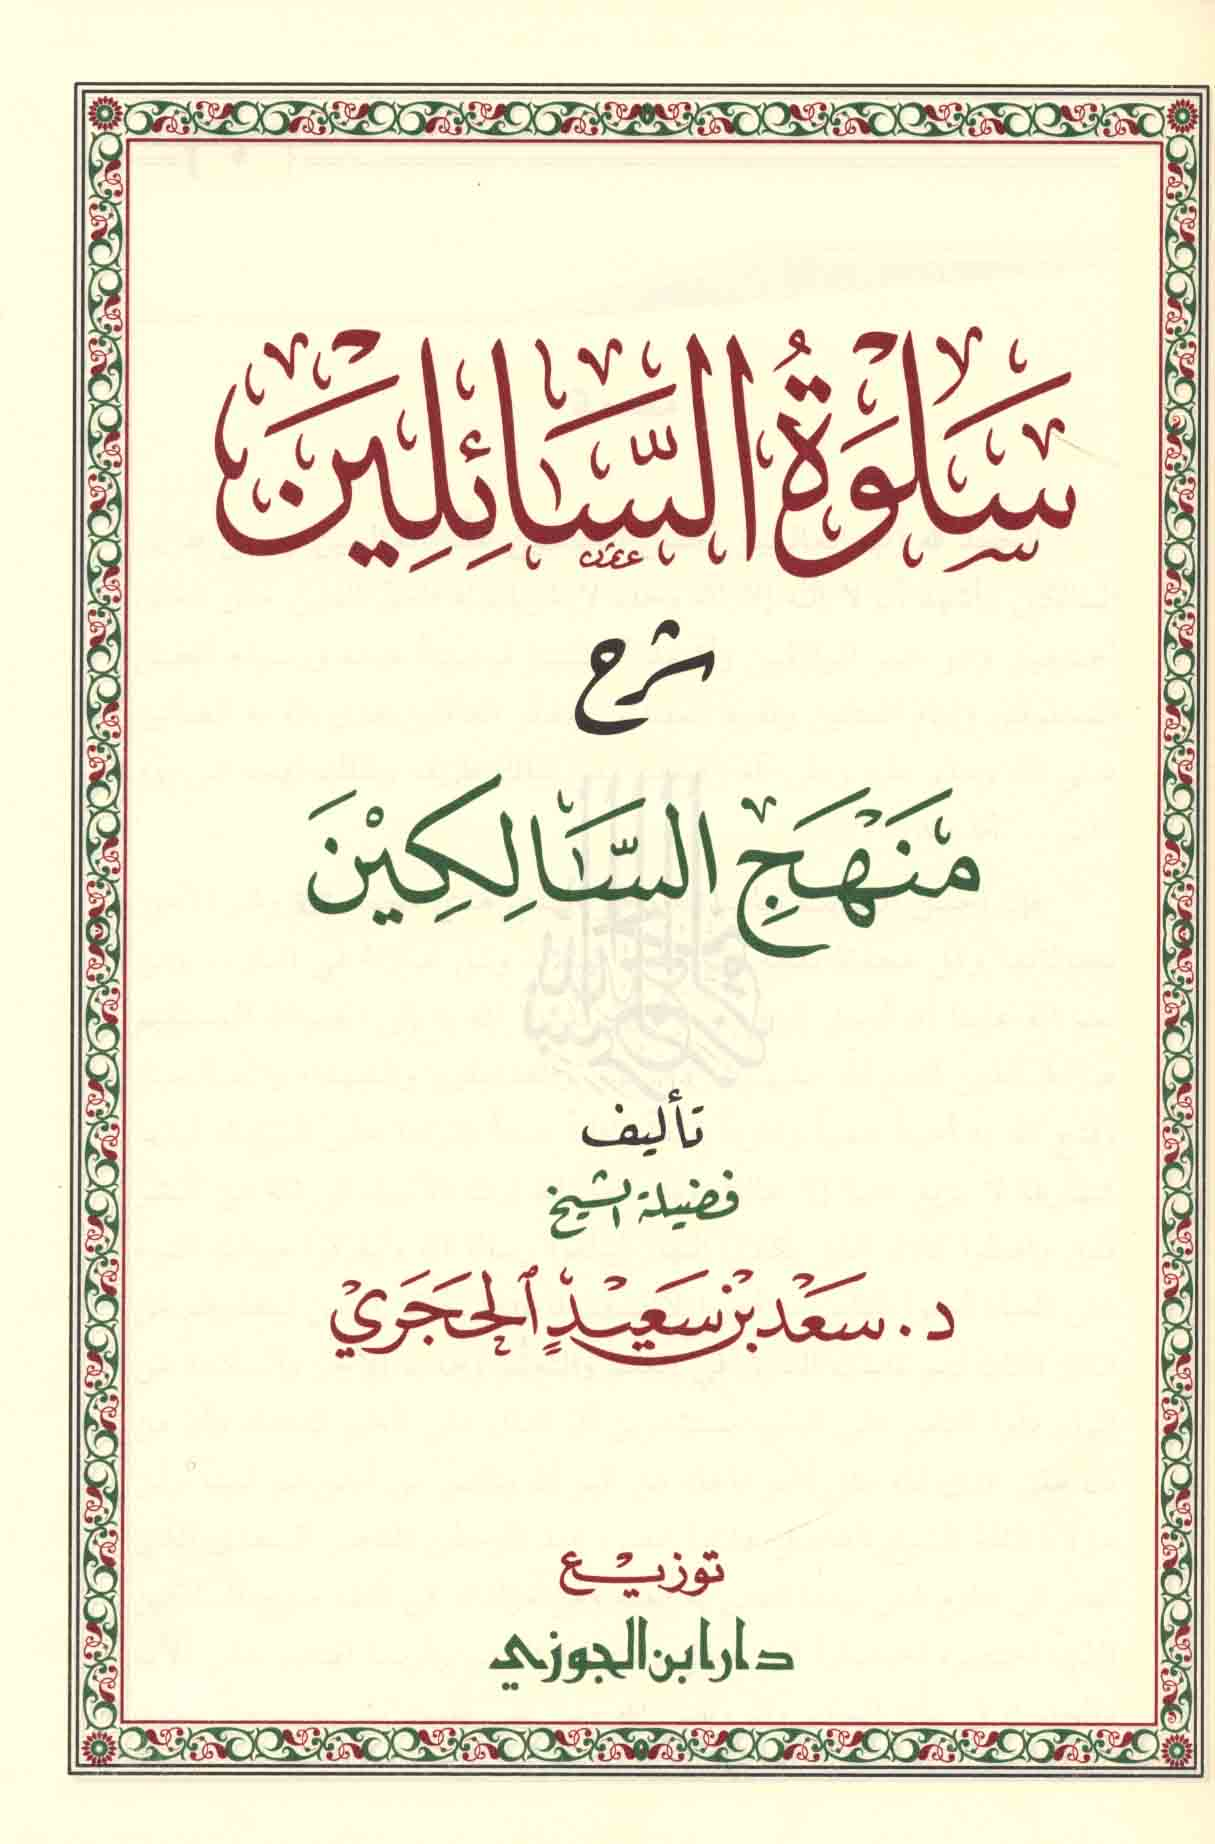 سـلـوة الـسـائـلـيـن شـرح مـنـهـج الـسـالـكـيـن - Salwat al-sailin sharh  Manhaj al-salikin - ArabicBookshop.net - Supplier of Arabic Books